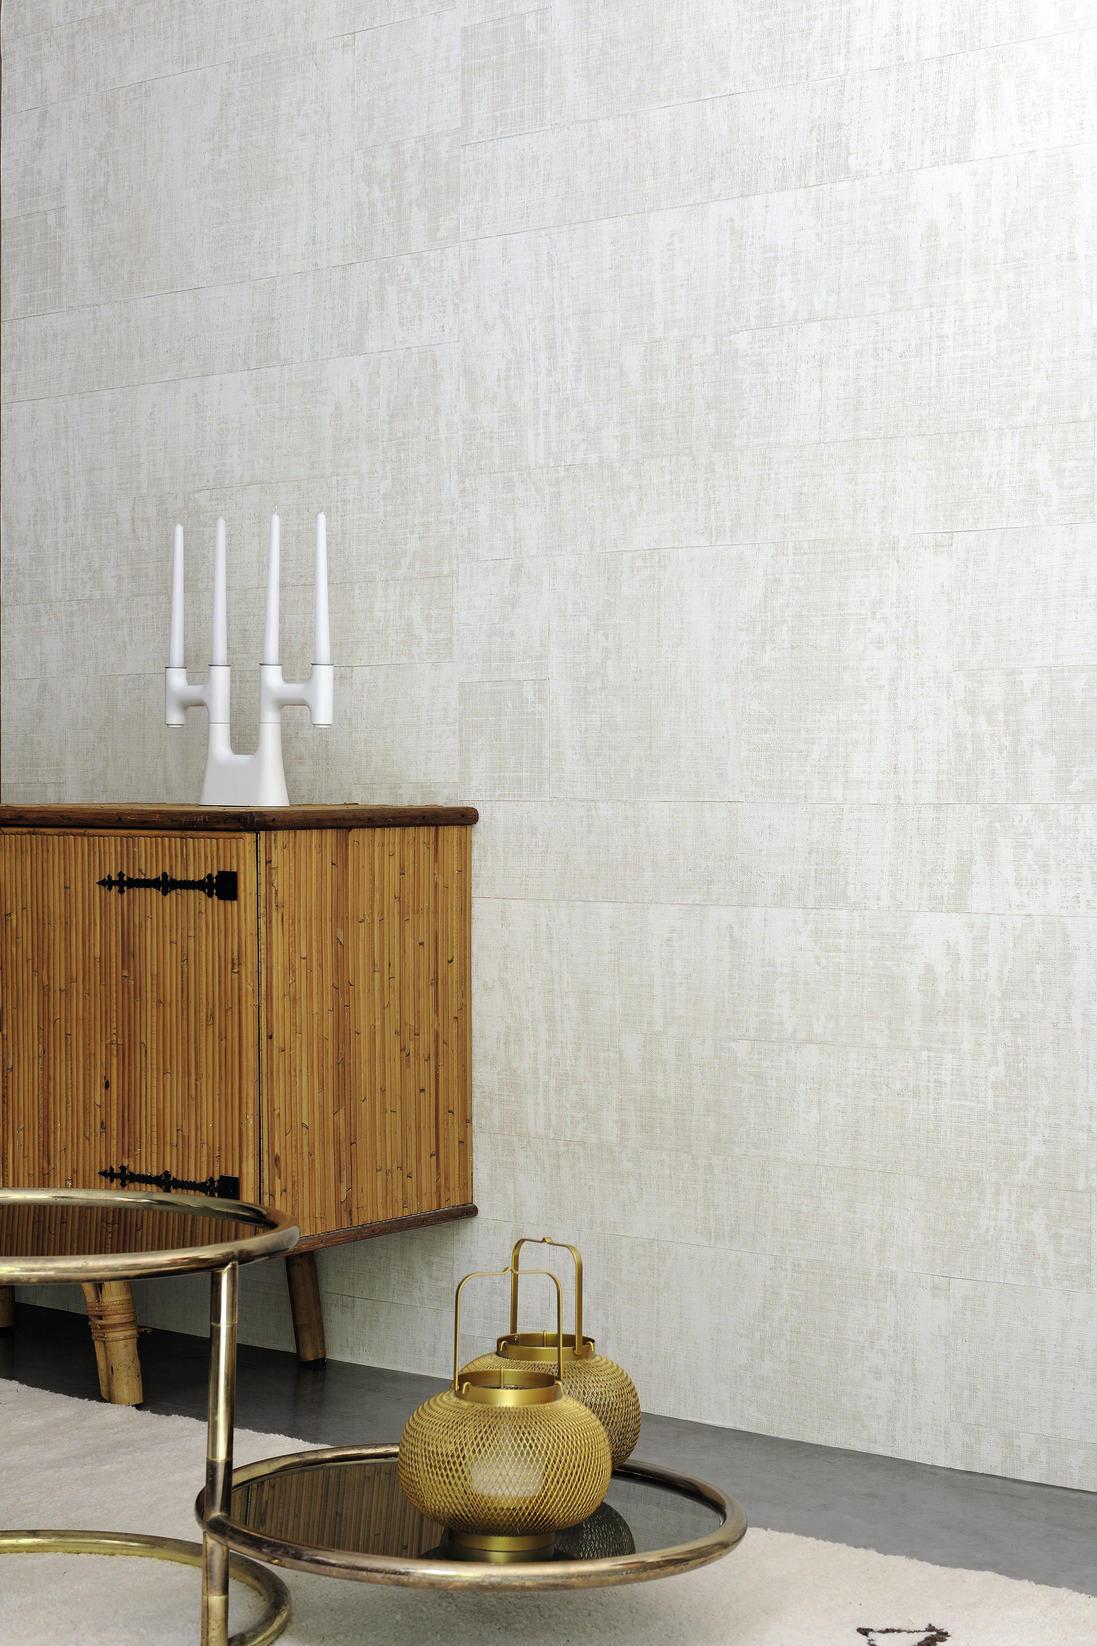 eldorado atelier d artiste vp 880 01 wall coverings. Black Bedroom Furniture Sets. Home Design Ideas